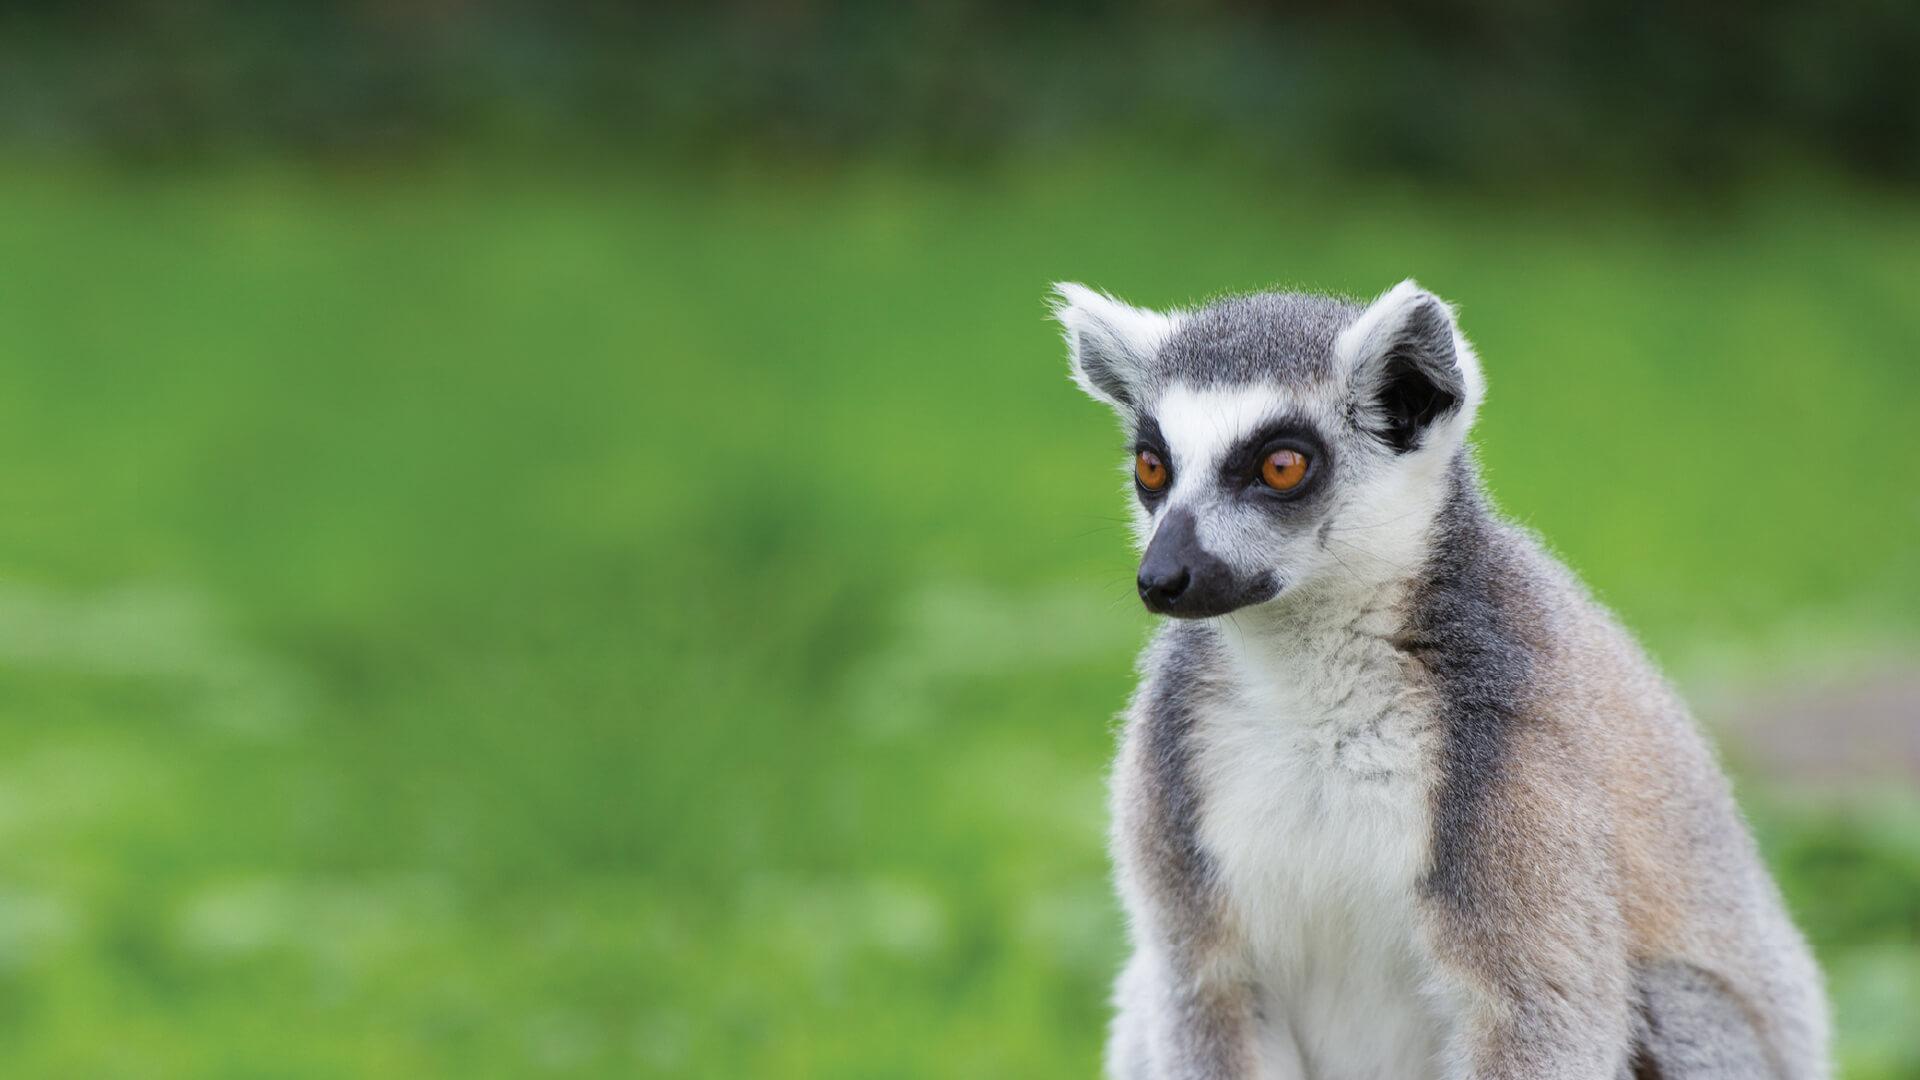 Ring-tailed lemur at Bristol Zoo Gardens